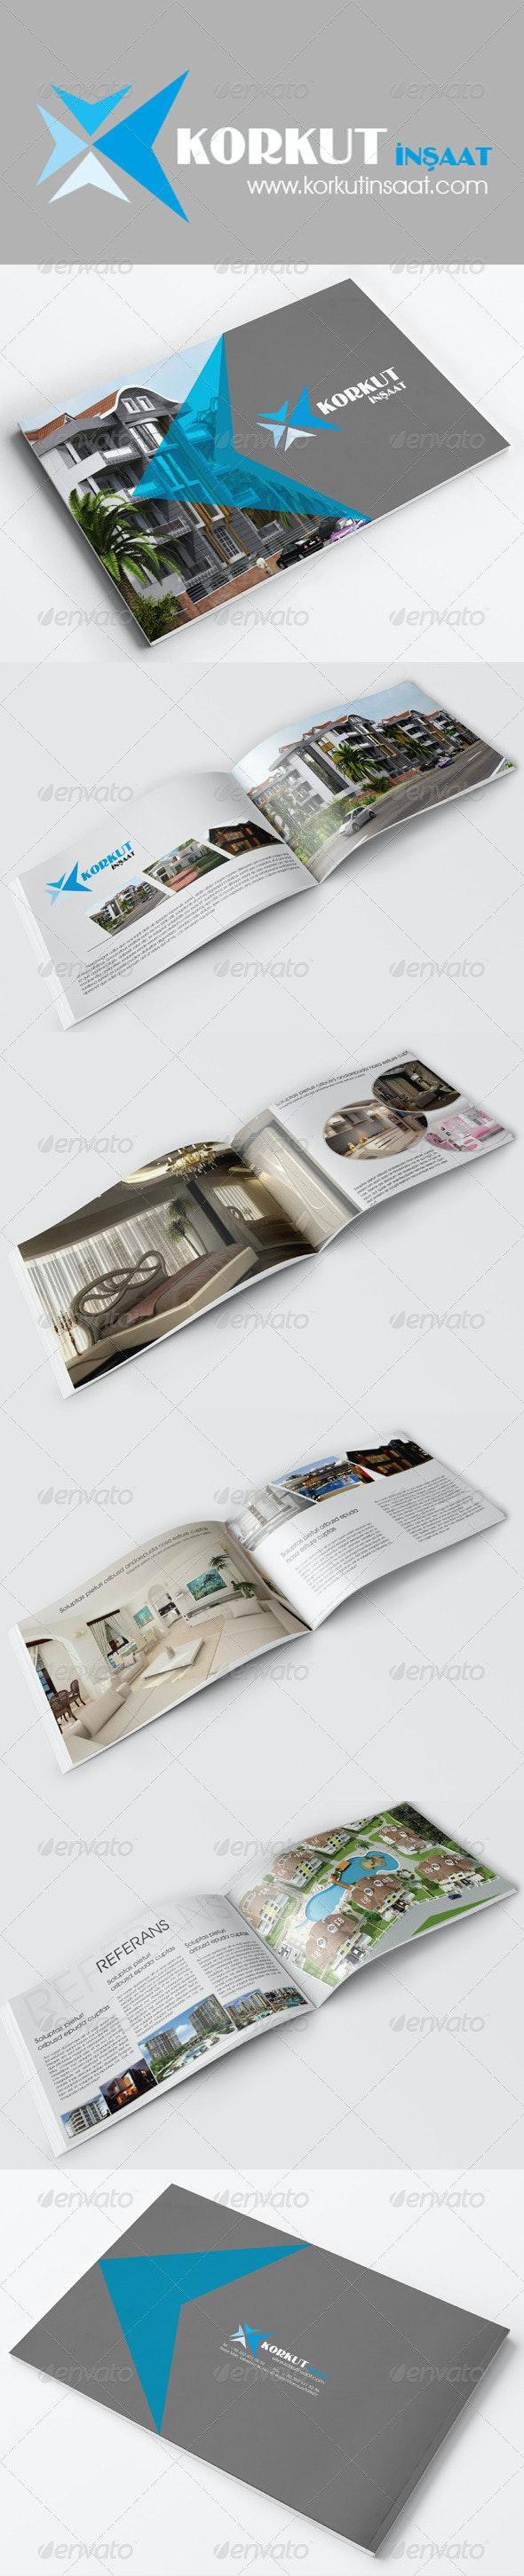 Korkut Construction Brochure - Brochures Print Templates